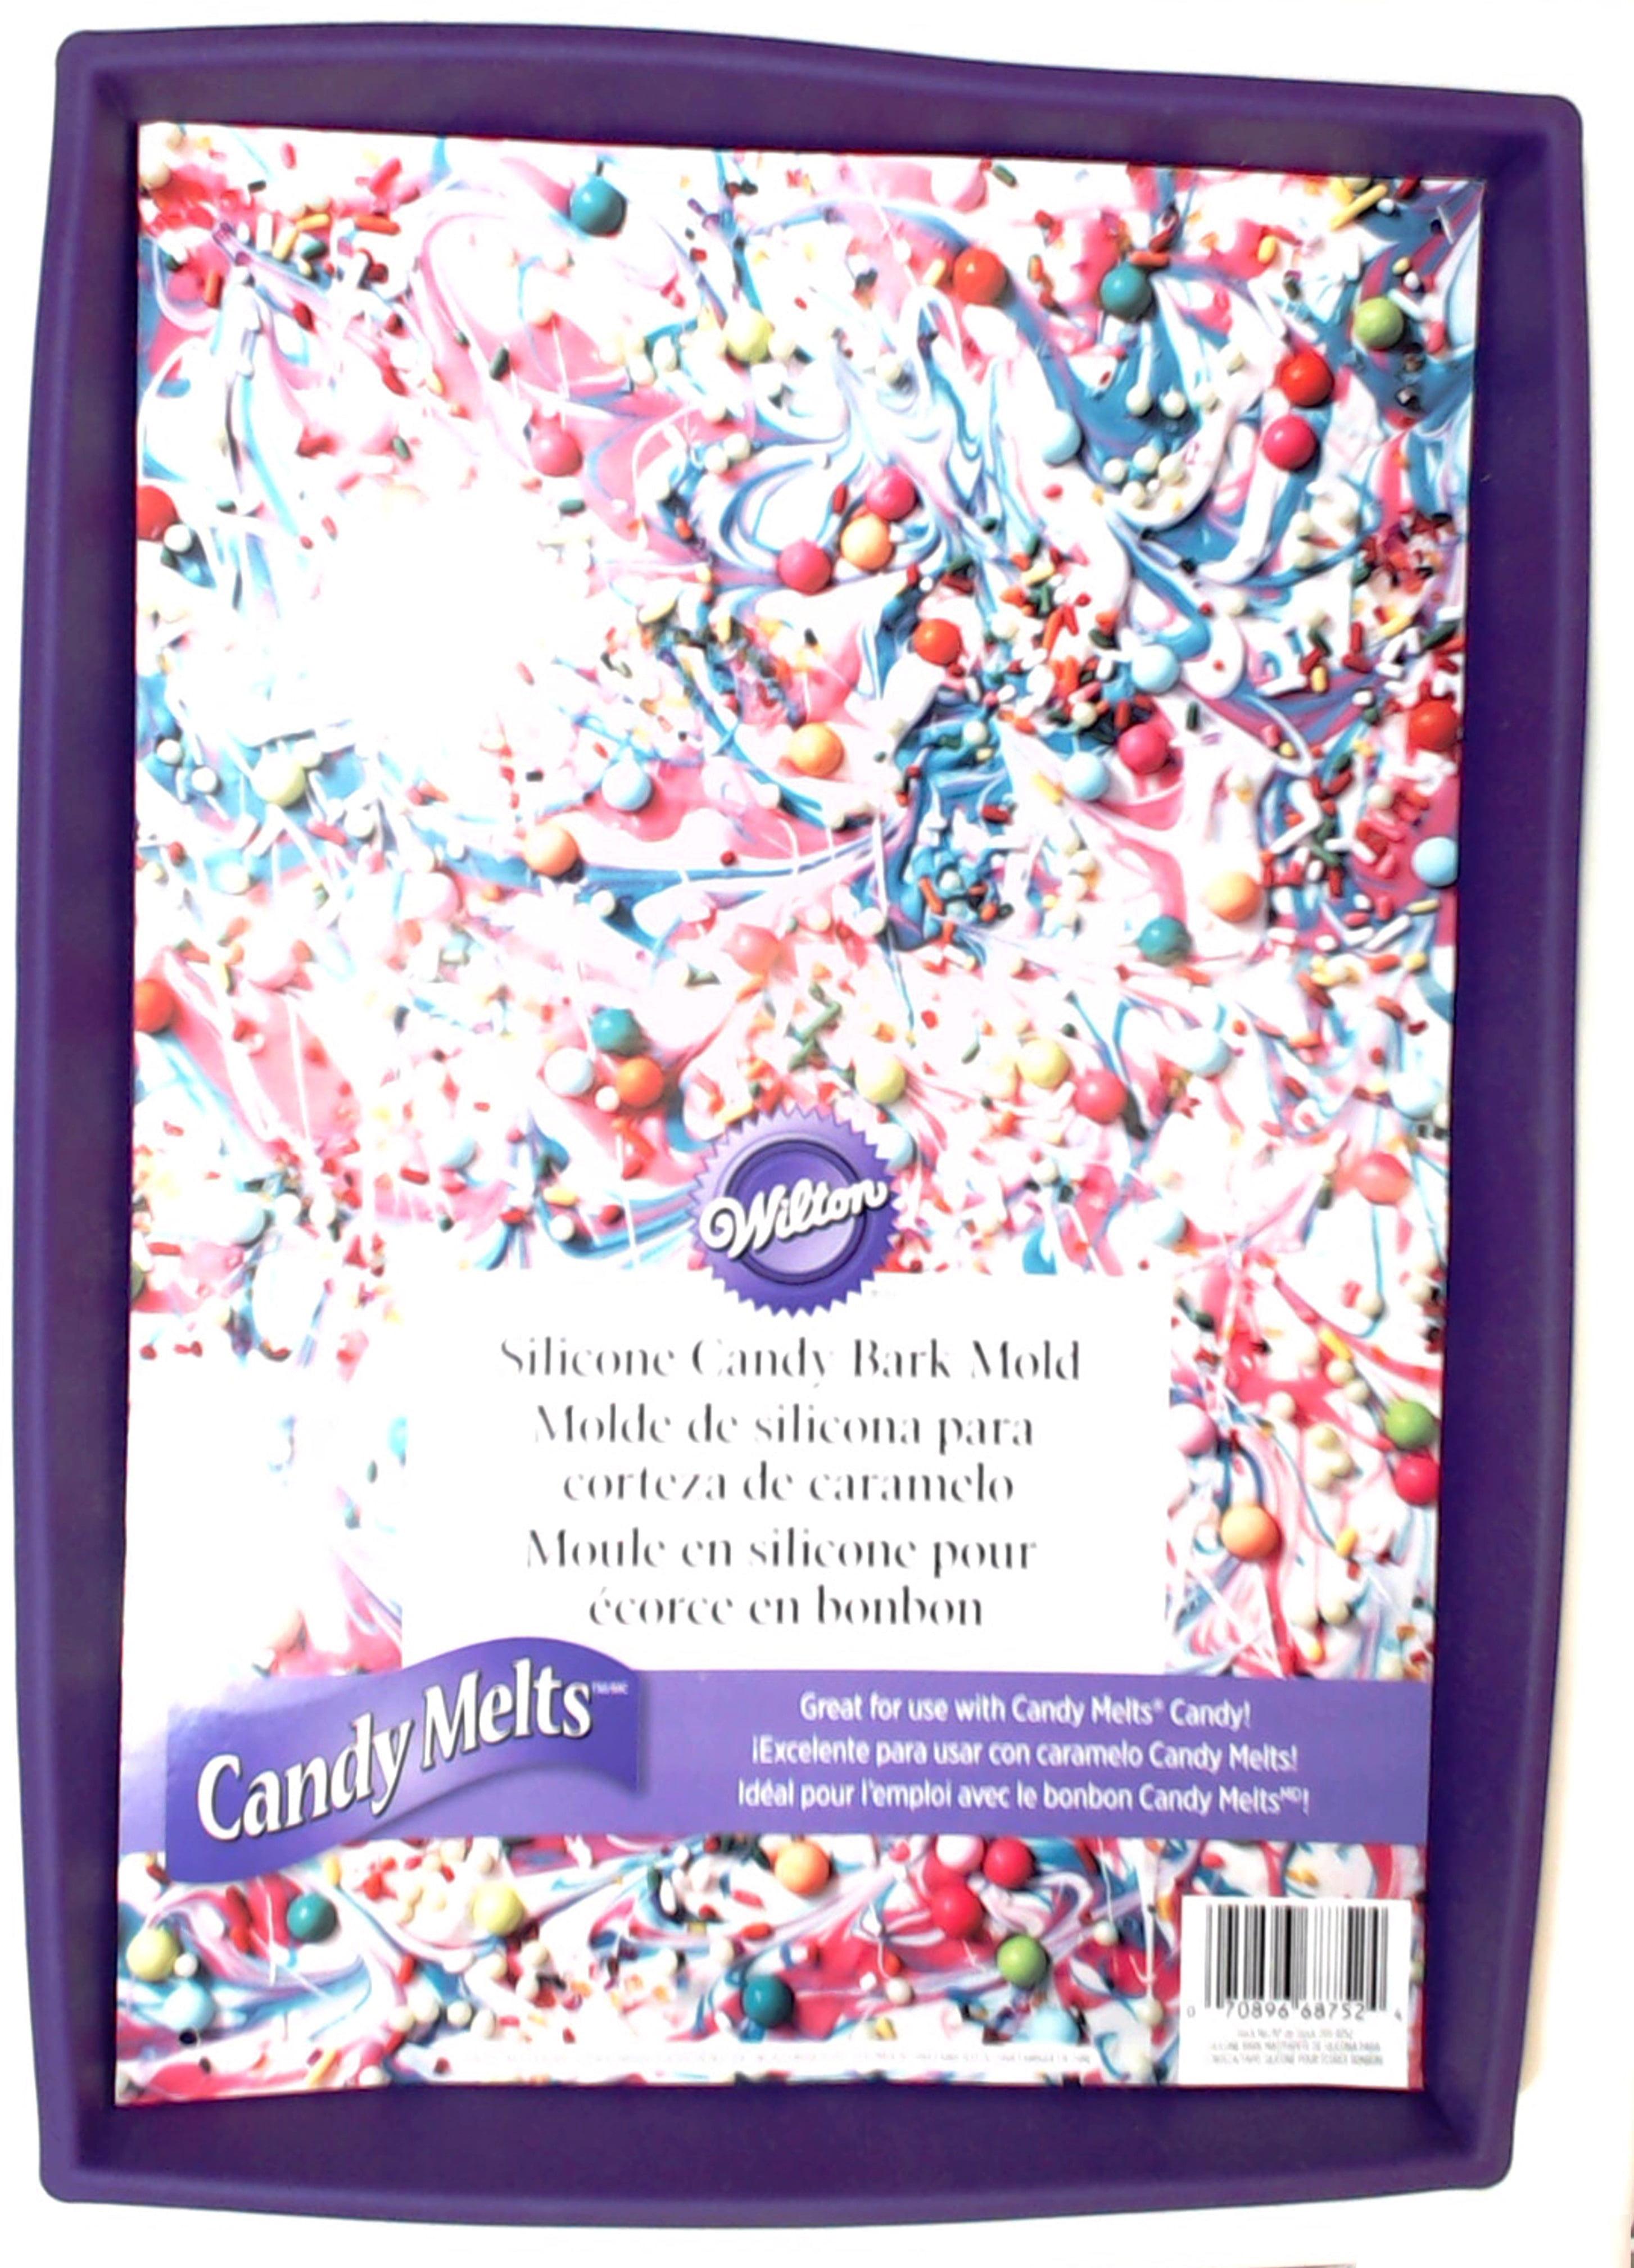 Wilton 2115-8752 Silicone Candy Bark Mold 9 x 13